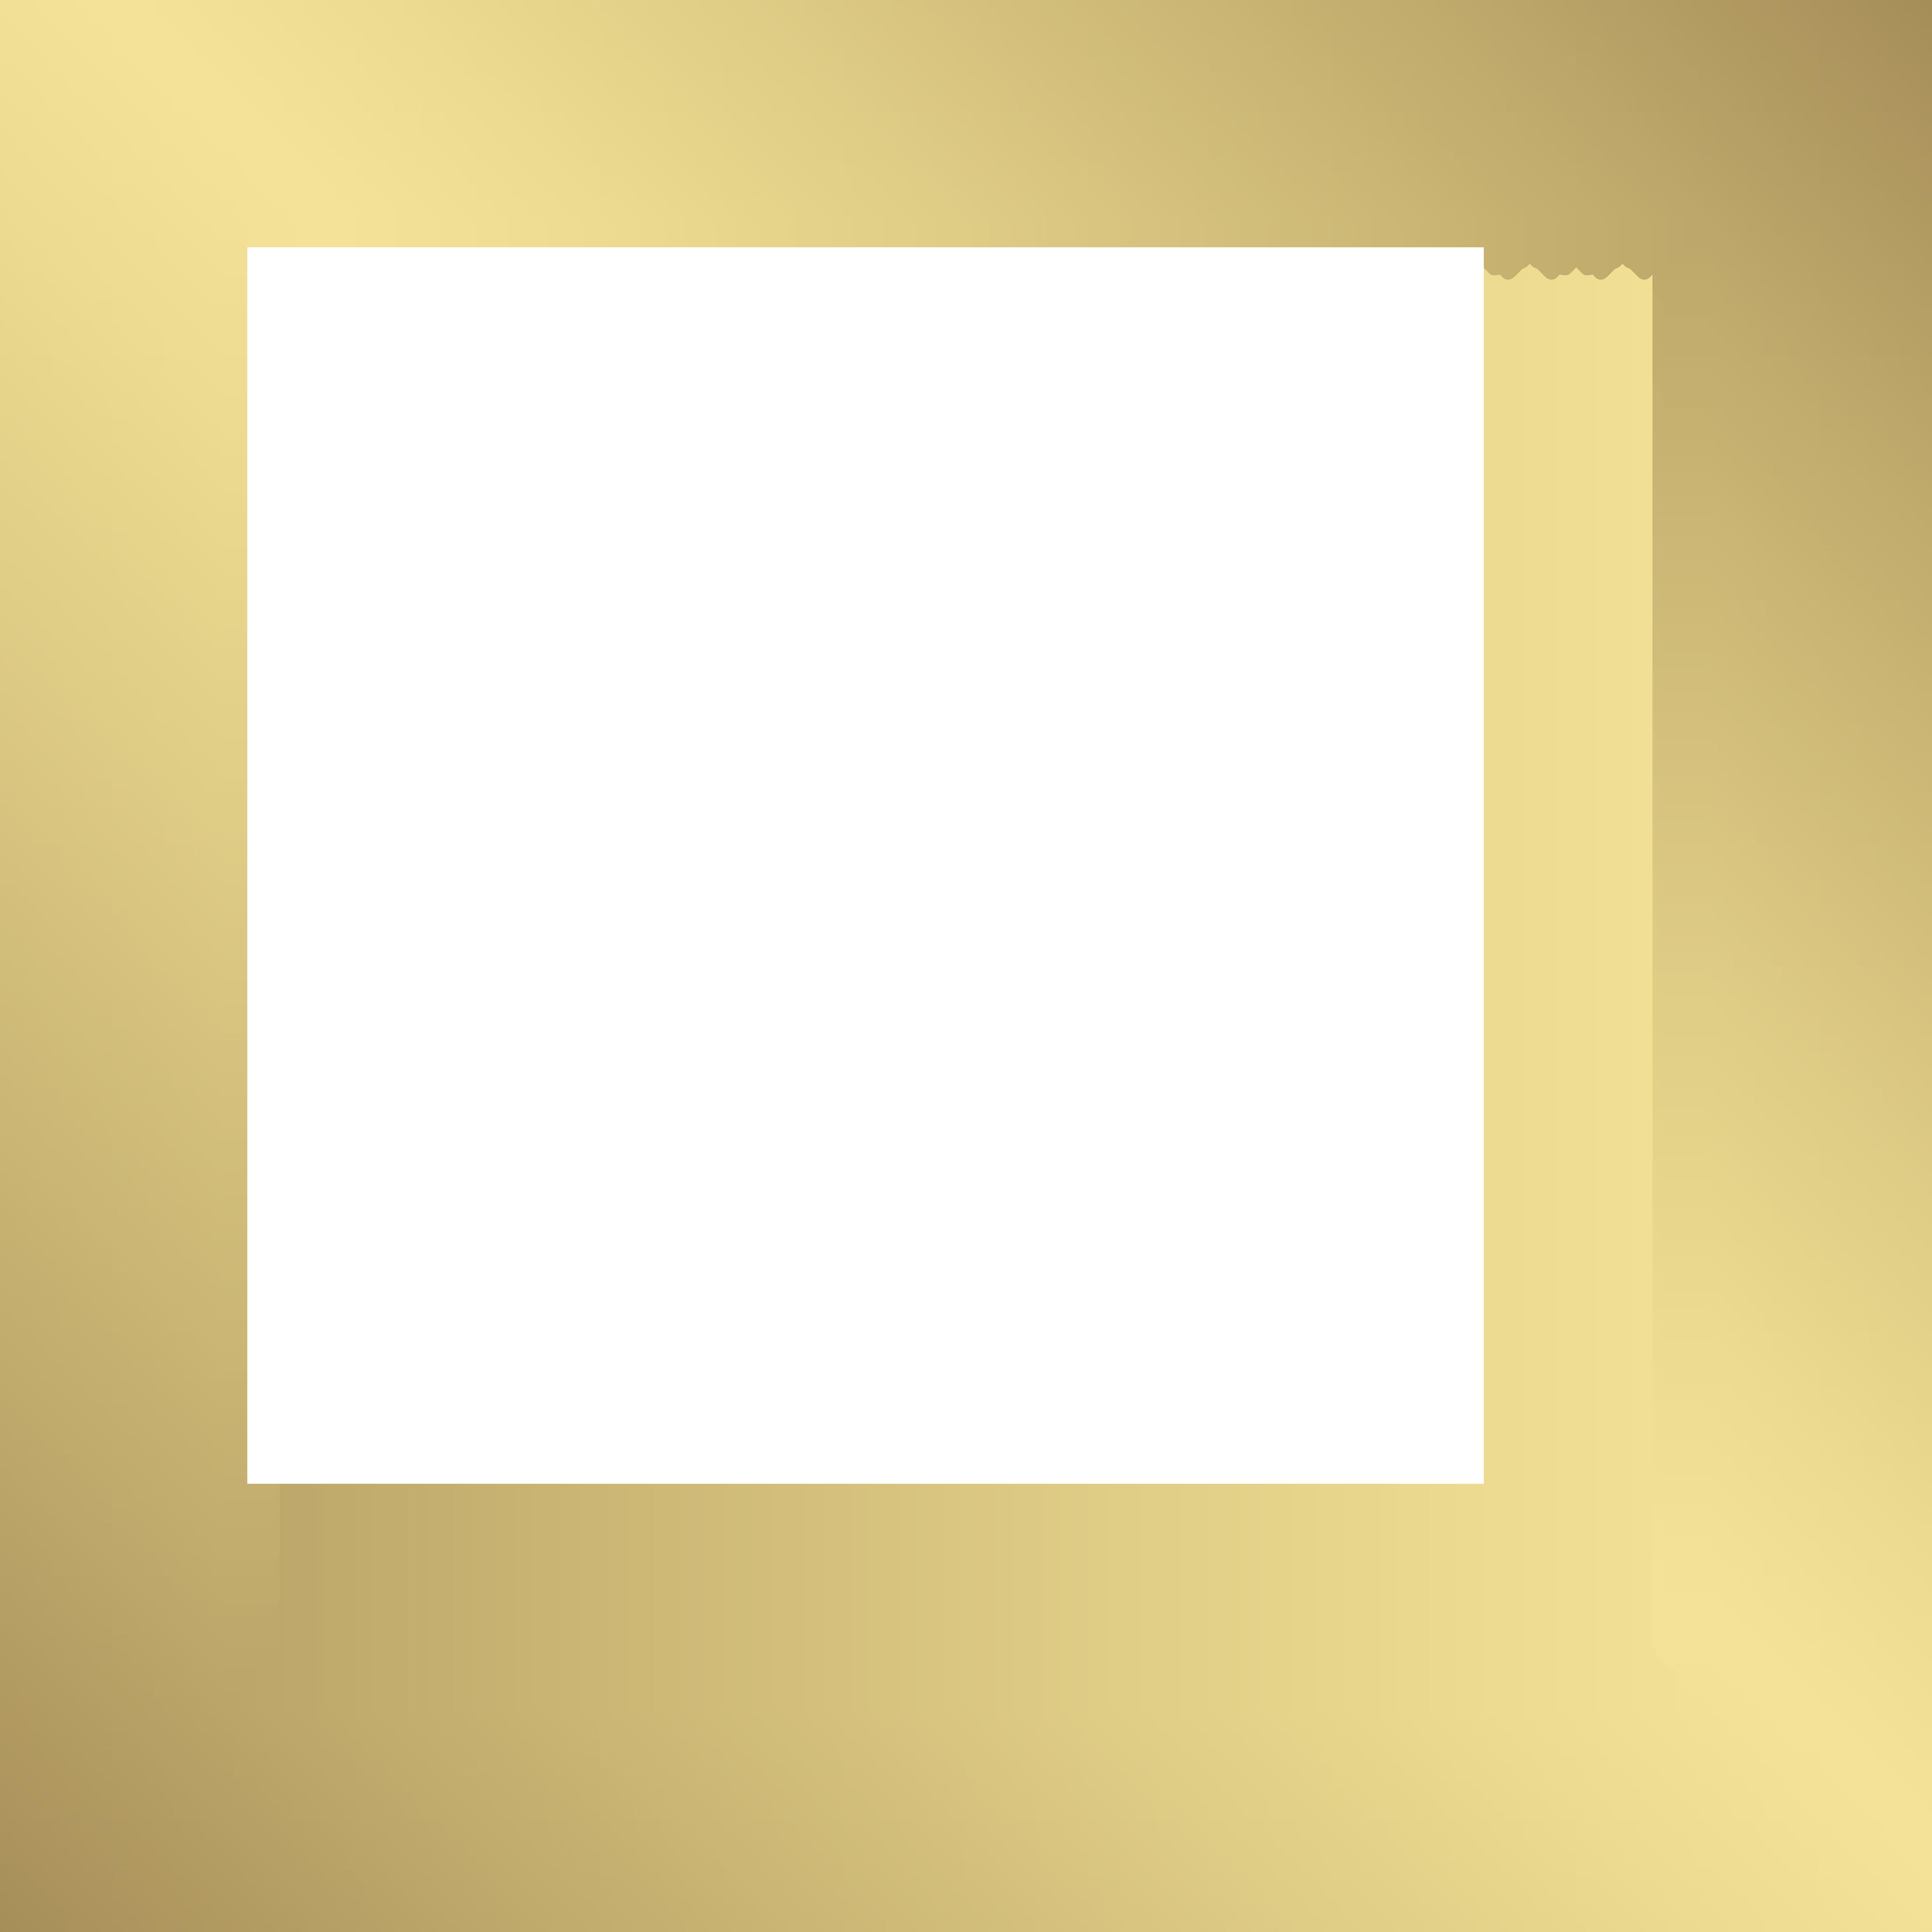 Square border png. Decorative frame gold clip